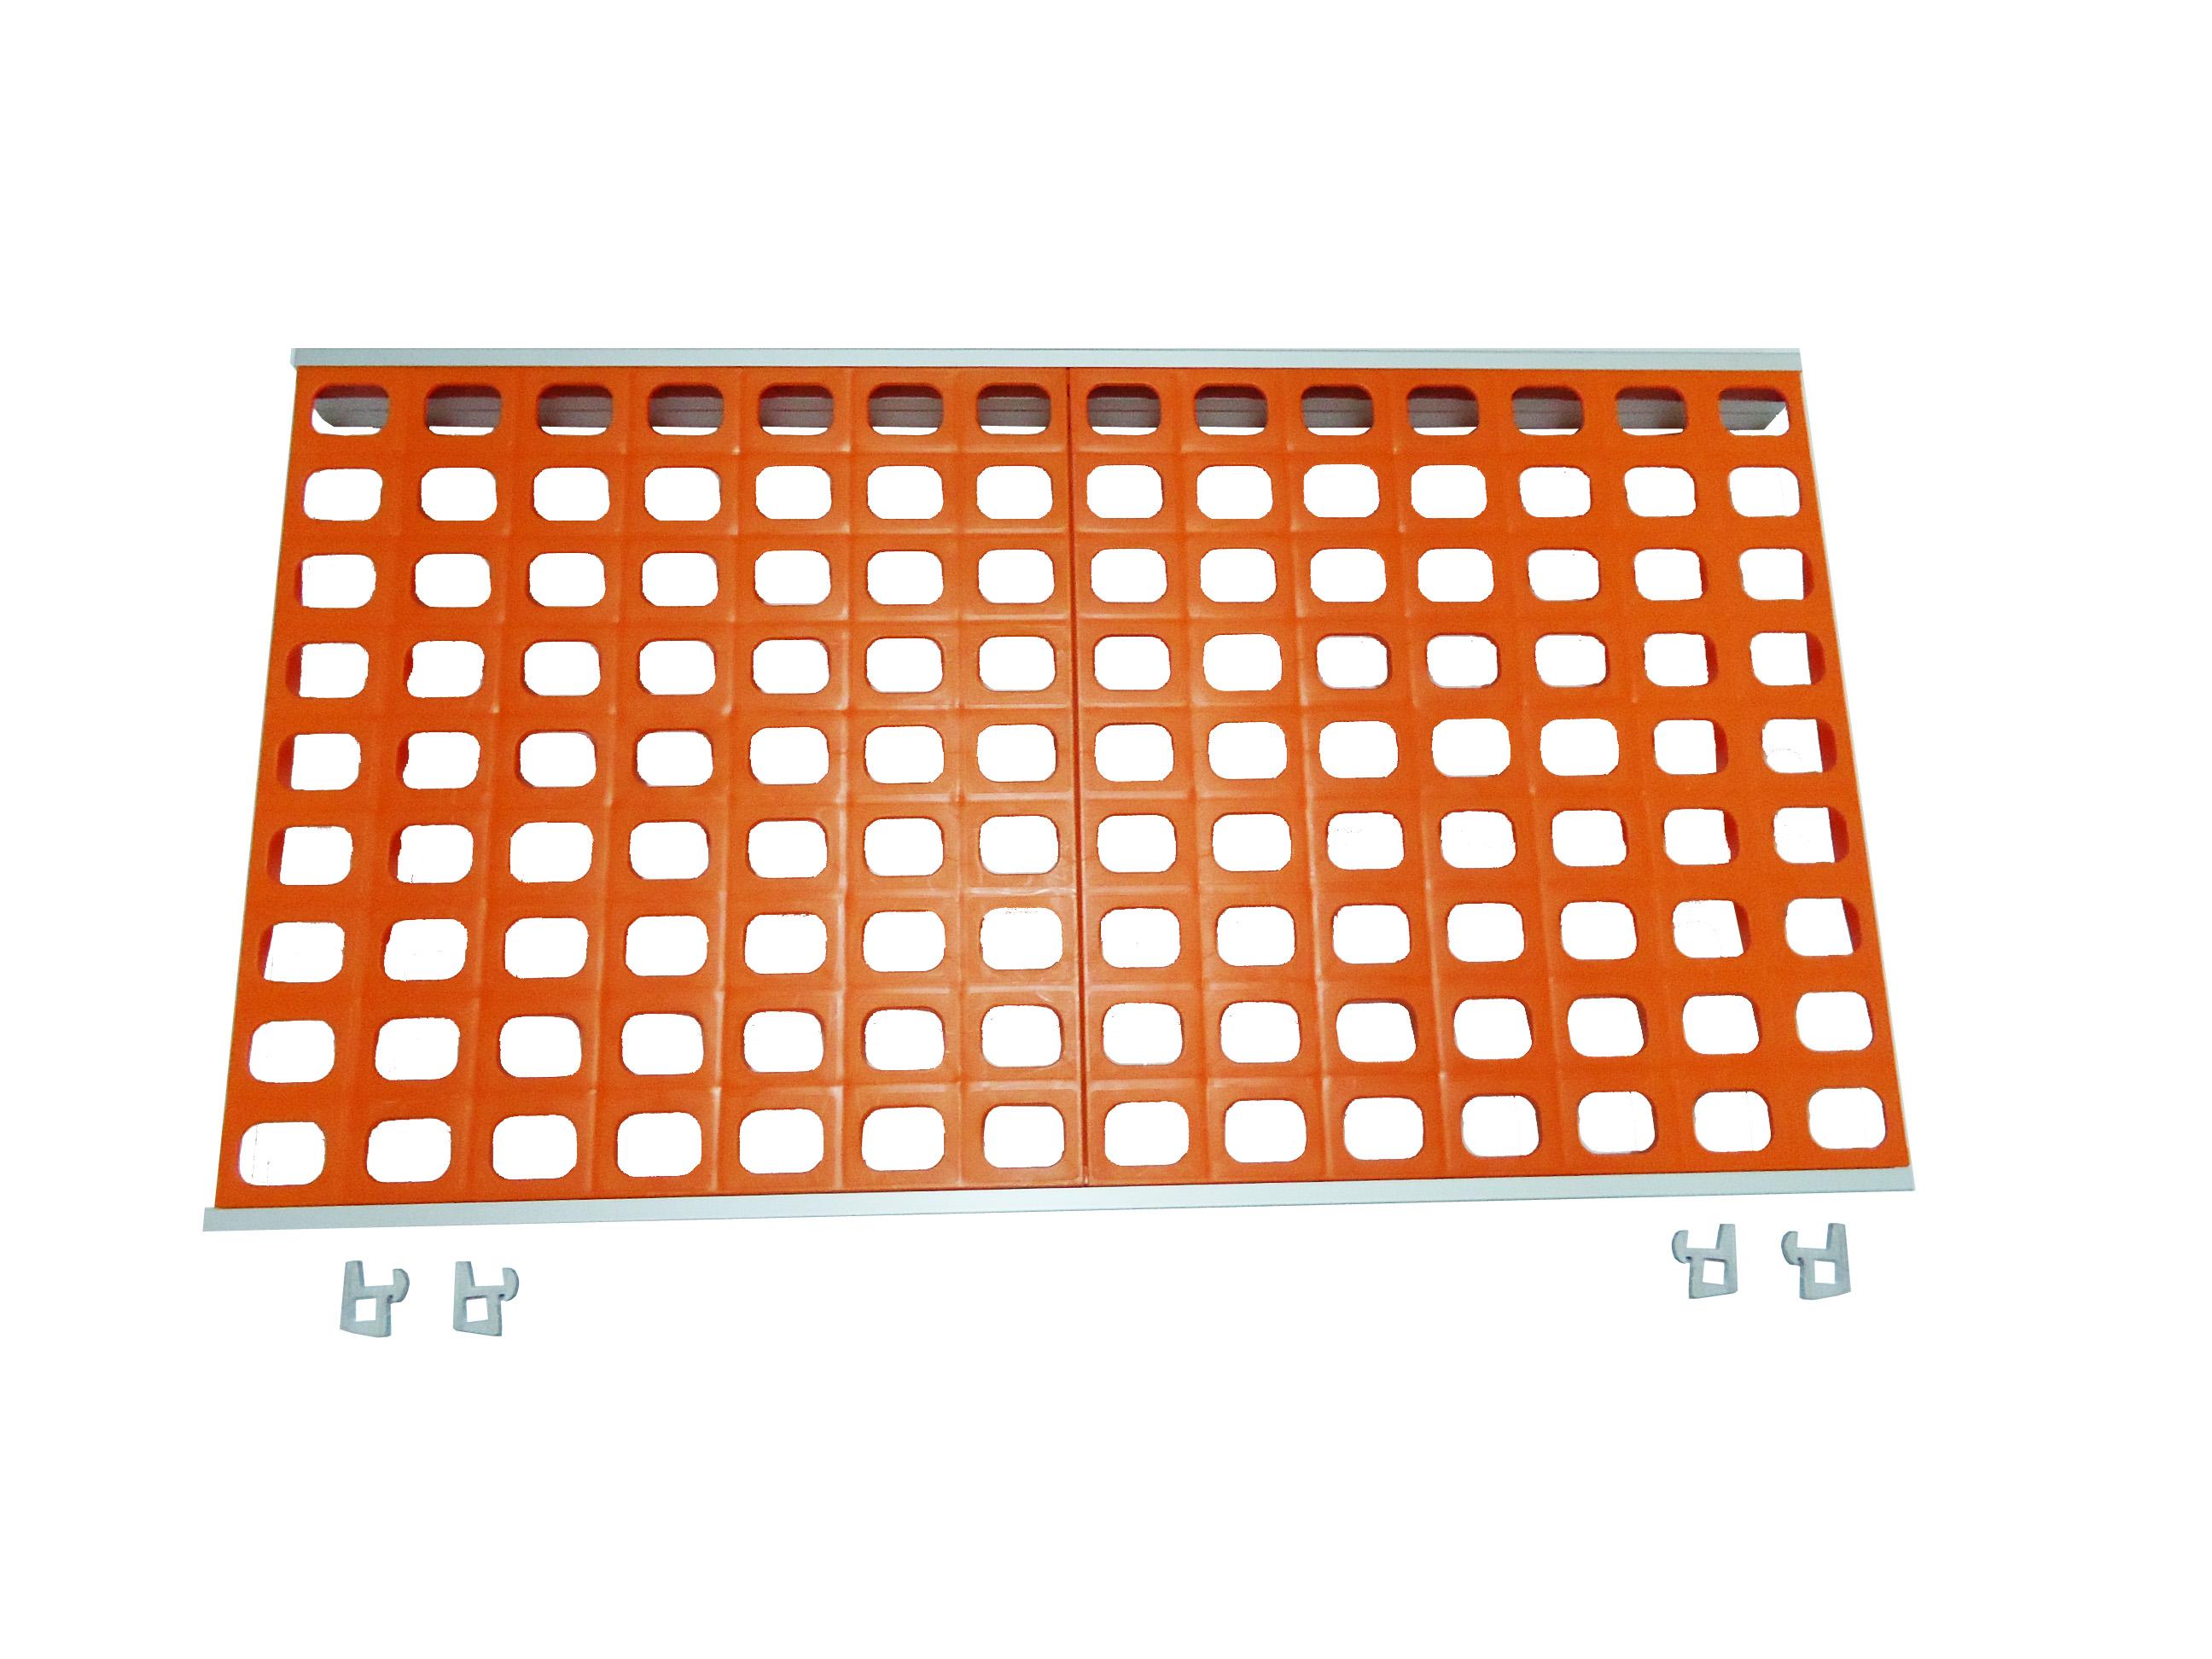 Coolblok KOPA47148C Ραφιέρα - Ράφι Ψυκτικών Θαλάμων Μονό Πολυαιθυλενίου - 1480x4 ψυκτικοί θάλαμοι    ράφια ψυκτικών θαλάμων  ψυκτικοί θάλαμοι    ράφια ψυκτικών θ